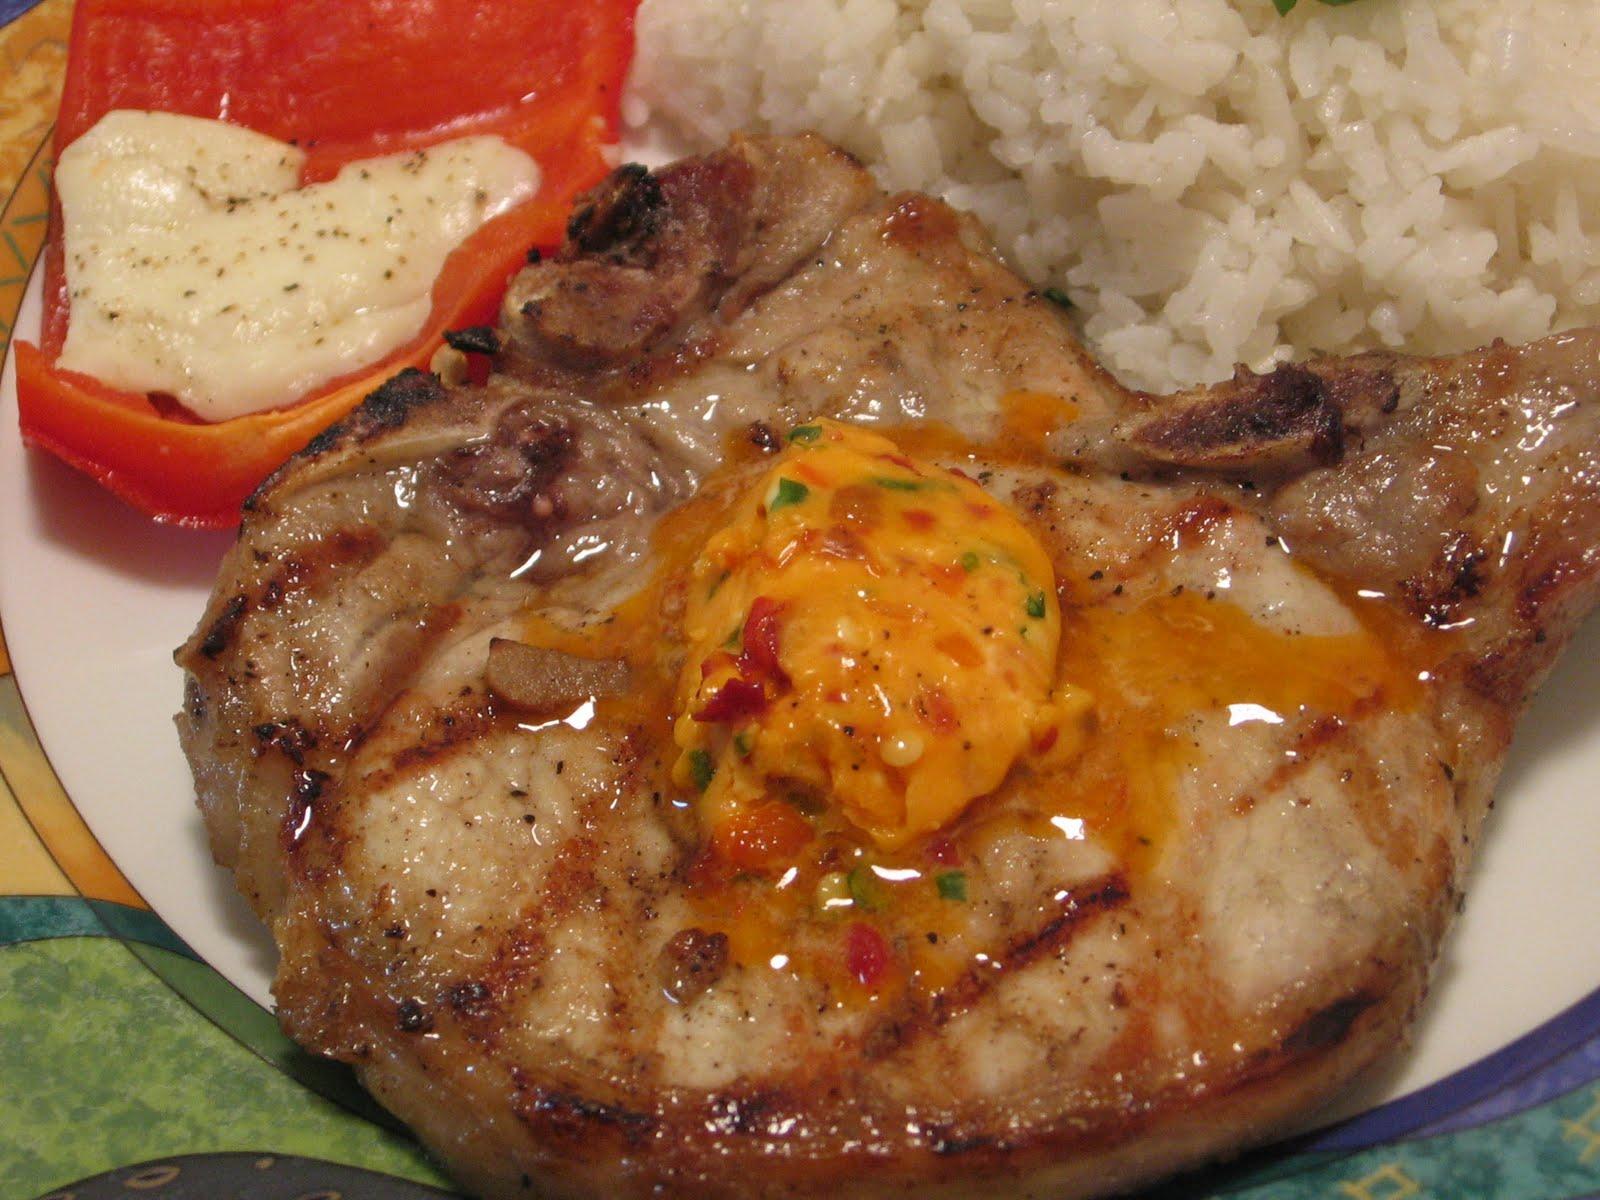 Jenn's Food Journey: Spicy Thai Pork Chops with Coconut Rice